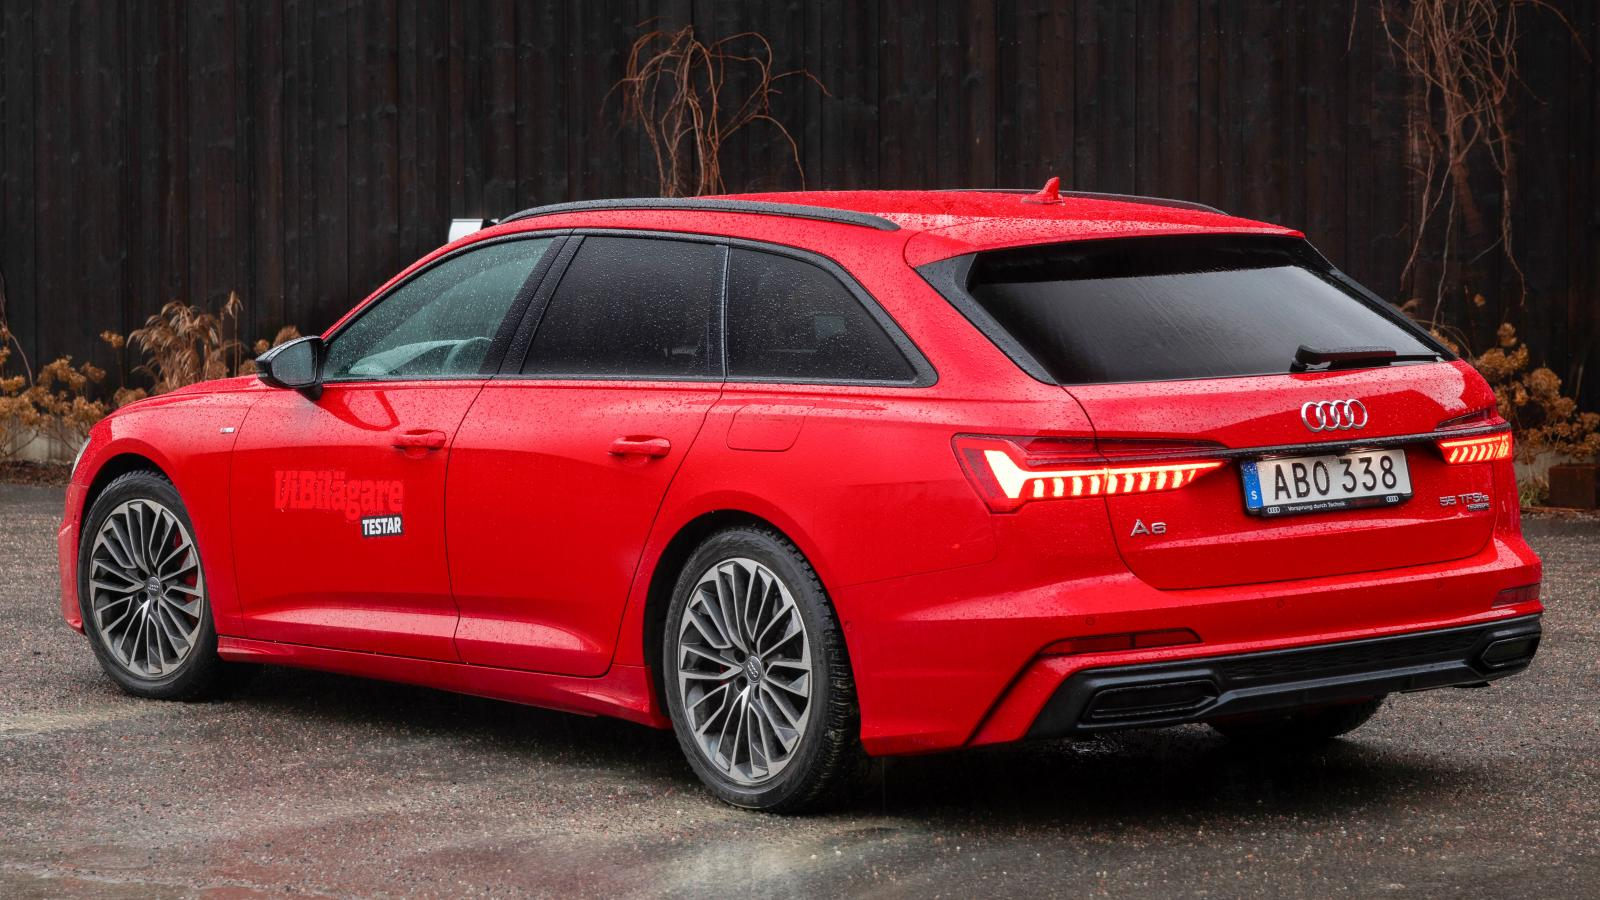 Audi A6 Avant 55 TFSIe quattro S tronic